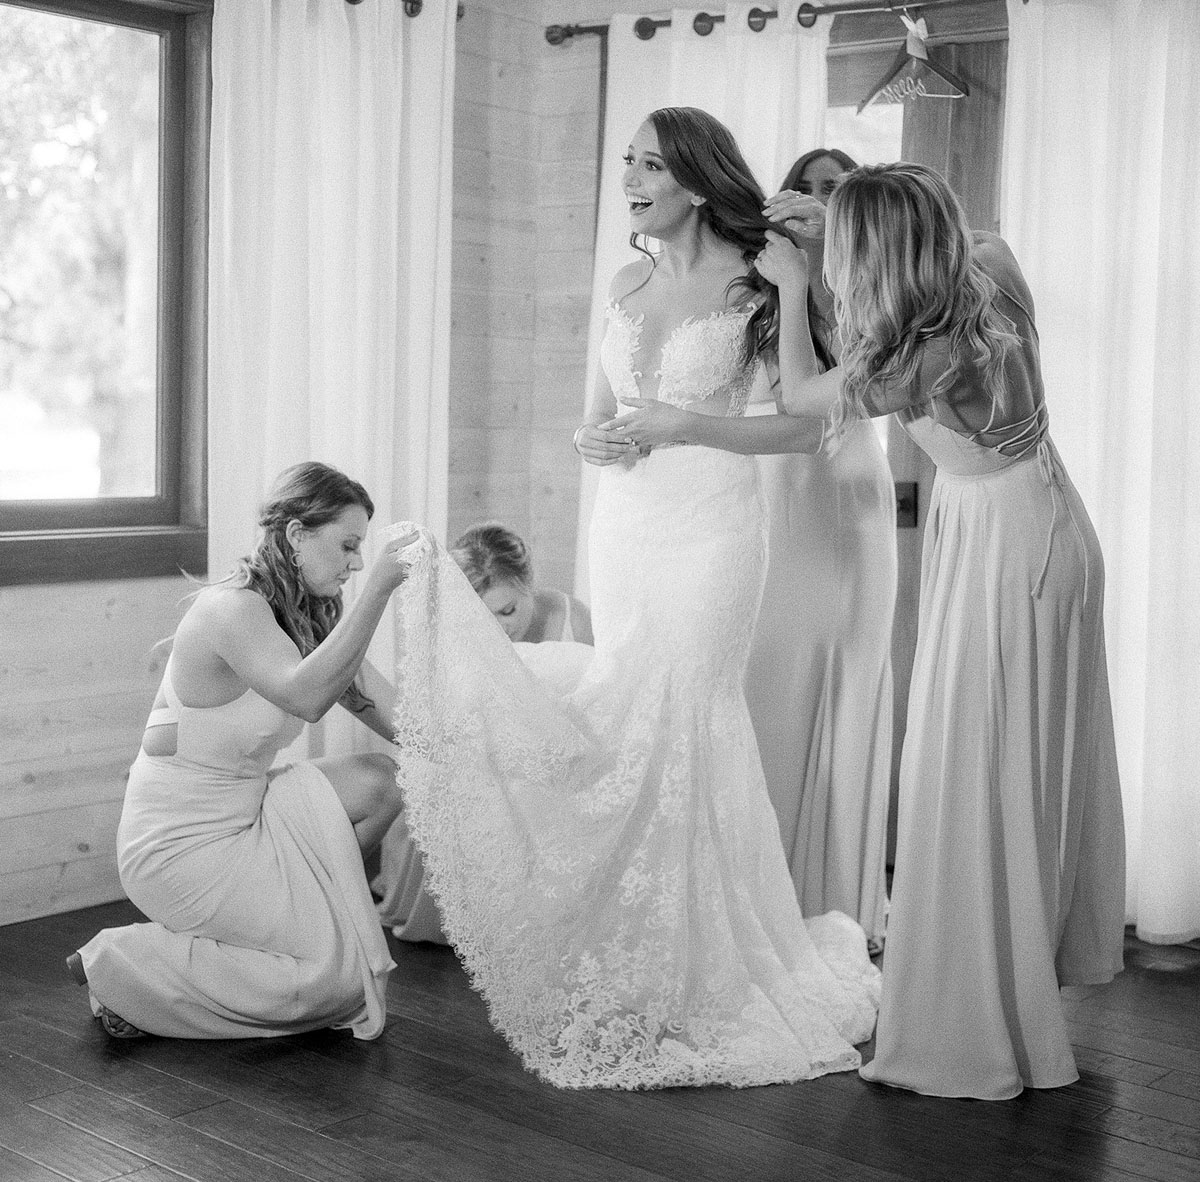 2-hasselblad-wedding-photography.jpg